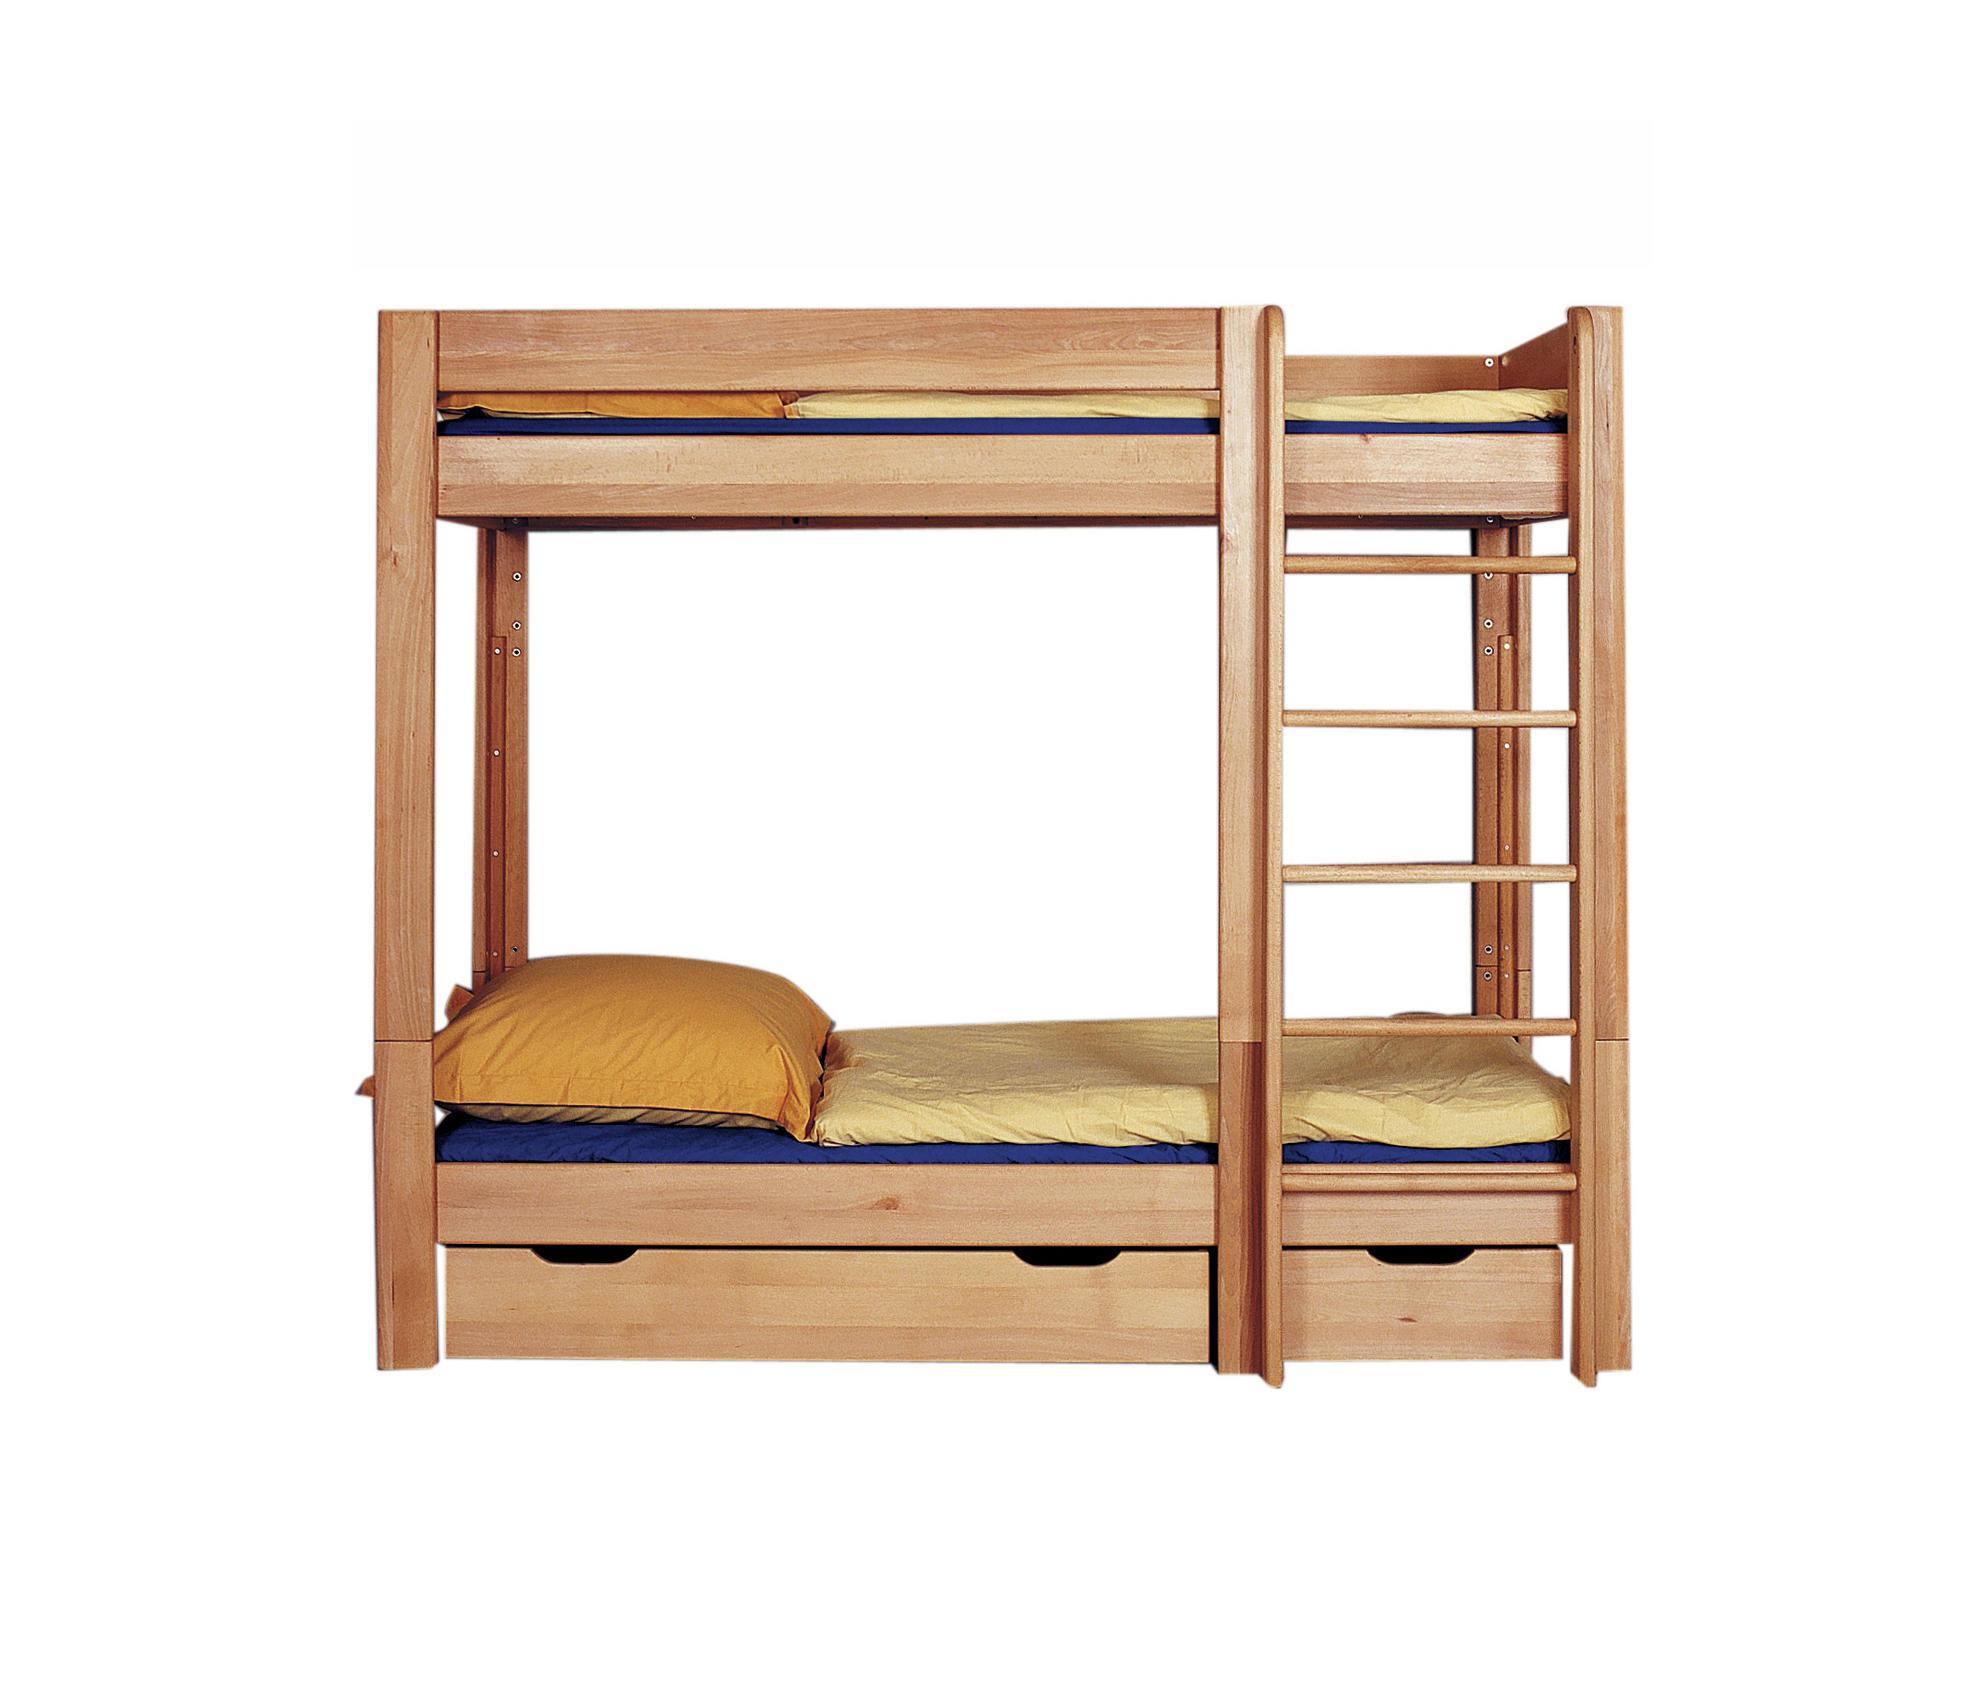 trax etagenbett kinderbetten von de breuyn architonic. Black Bedroom Furniture Sets. Home Design Ideas